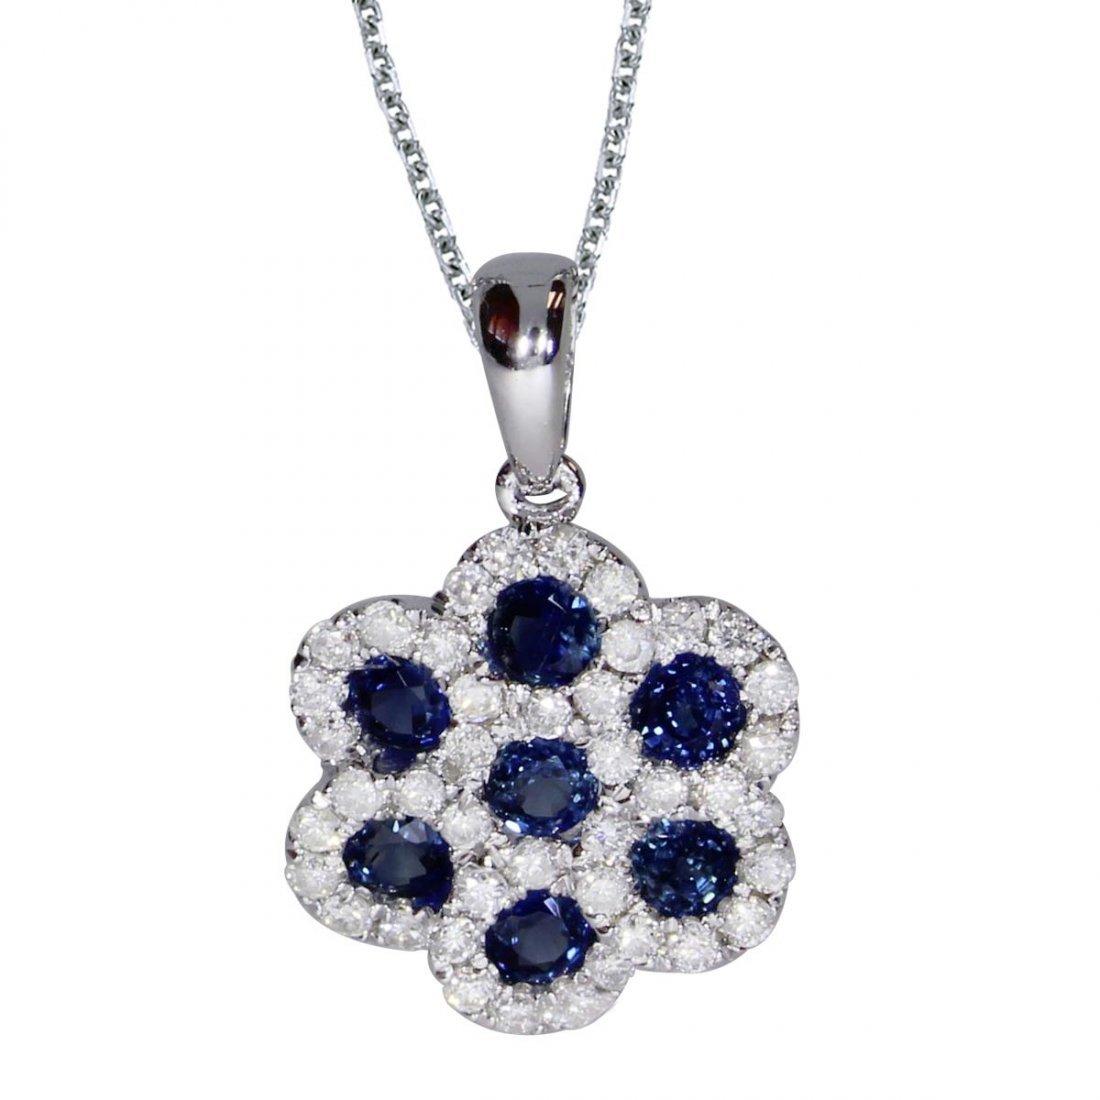 Certified 14k White Gold Round Sapphire Flower Pendant